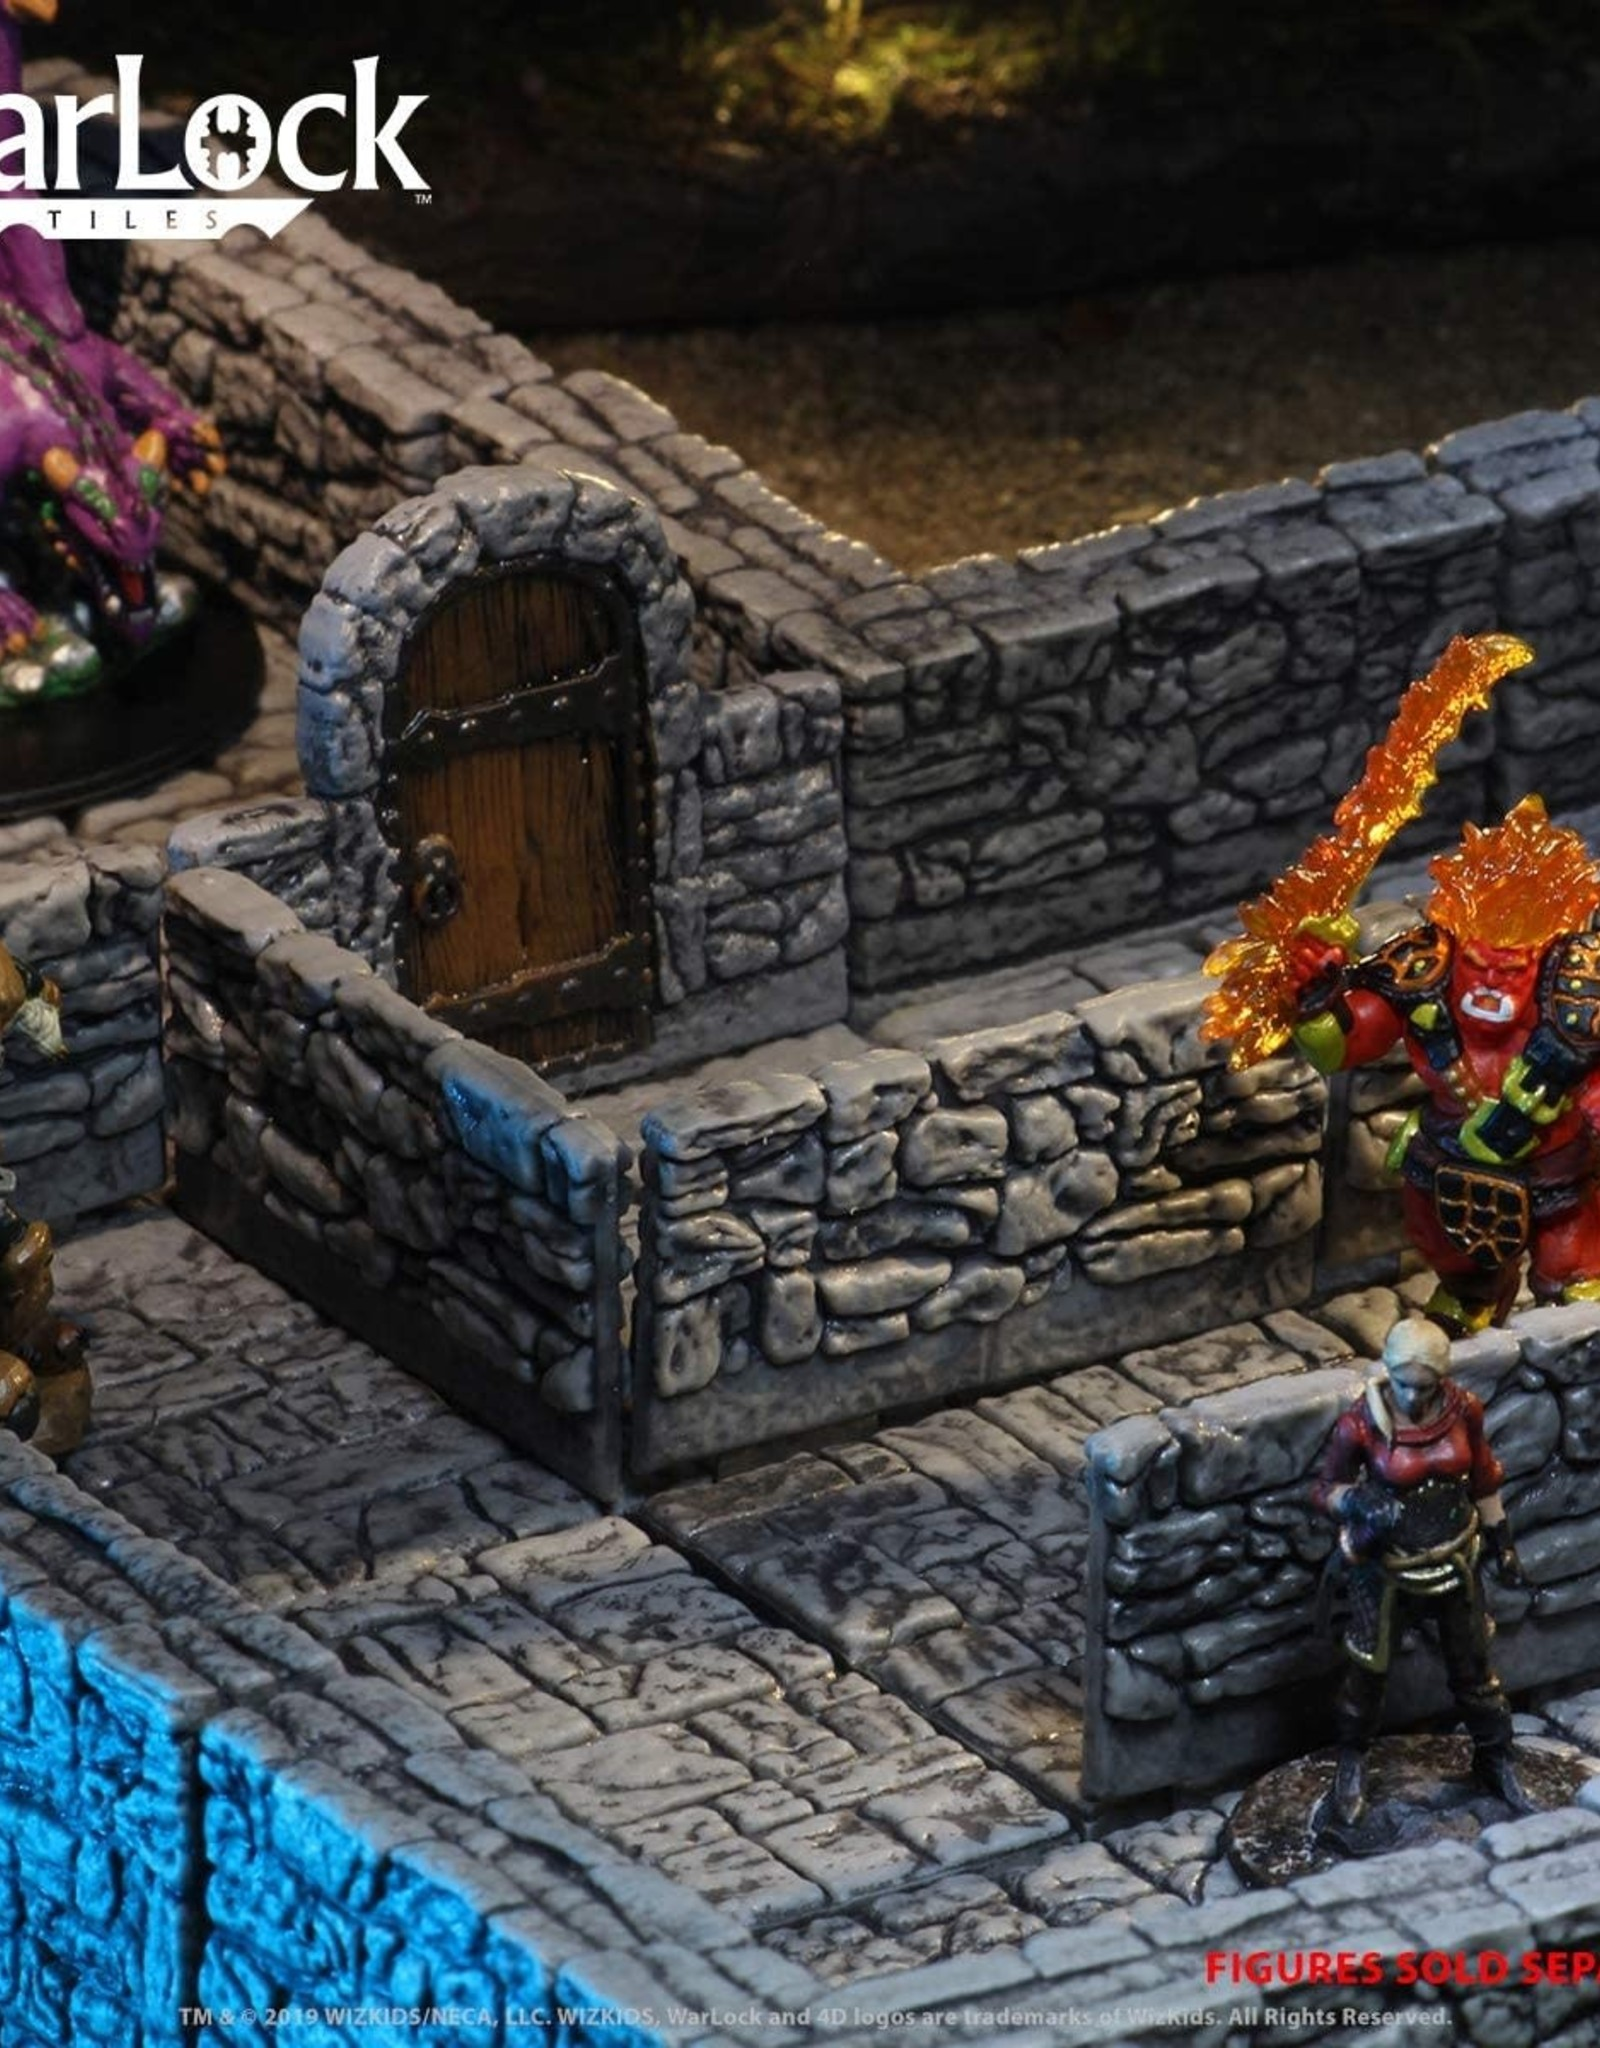 WarLock Tiles WarLock Tiles: Dungeon Tiles 1